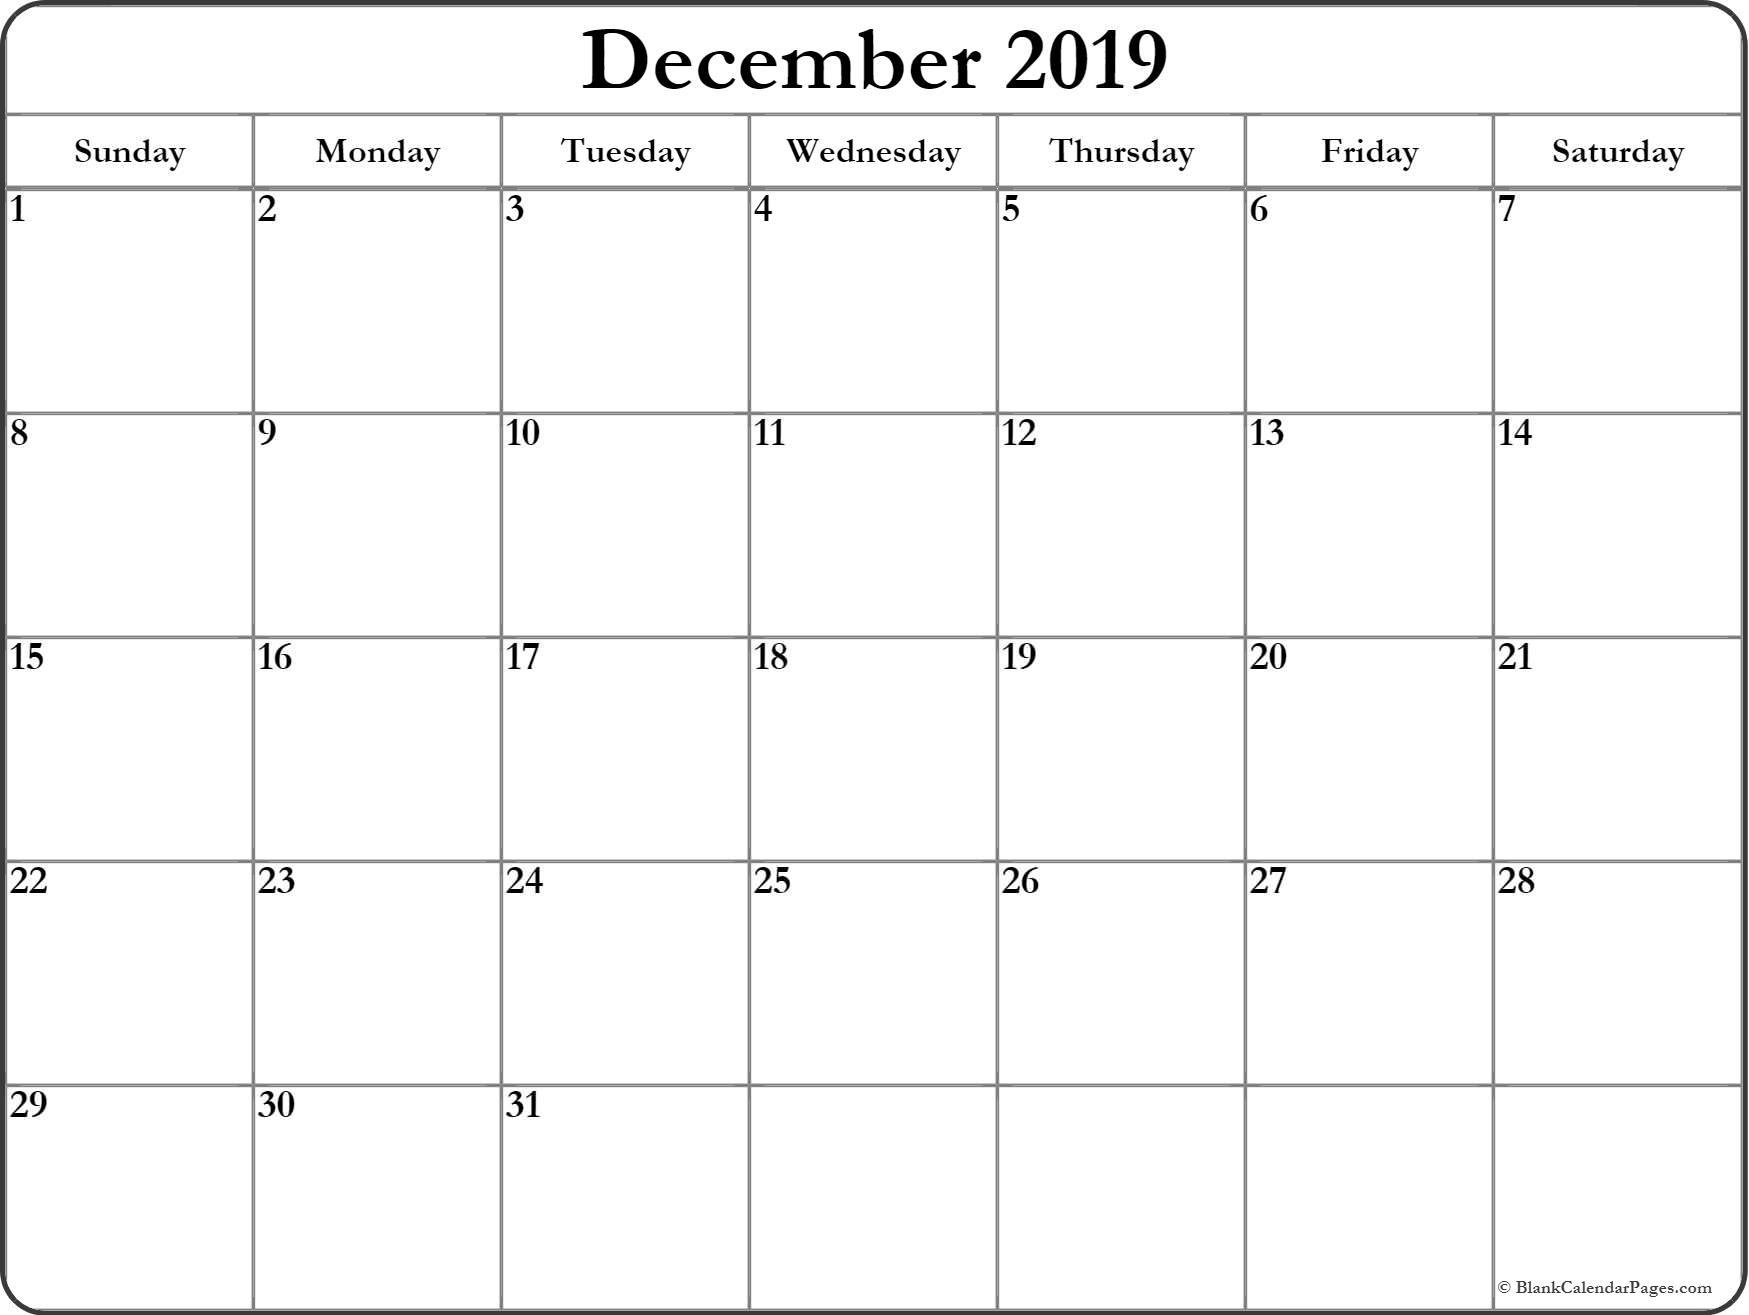 December 2019 Blank Calendar Templates. Within December 2019 throughout December Blank Calendar Page Printable